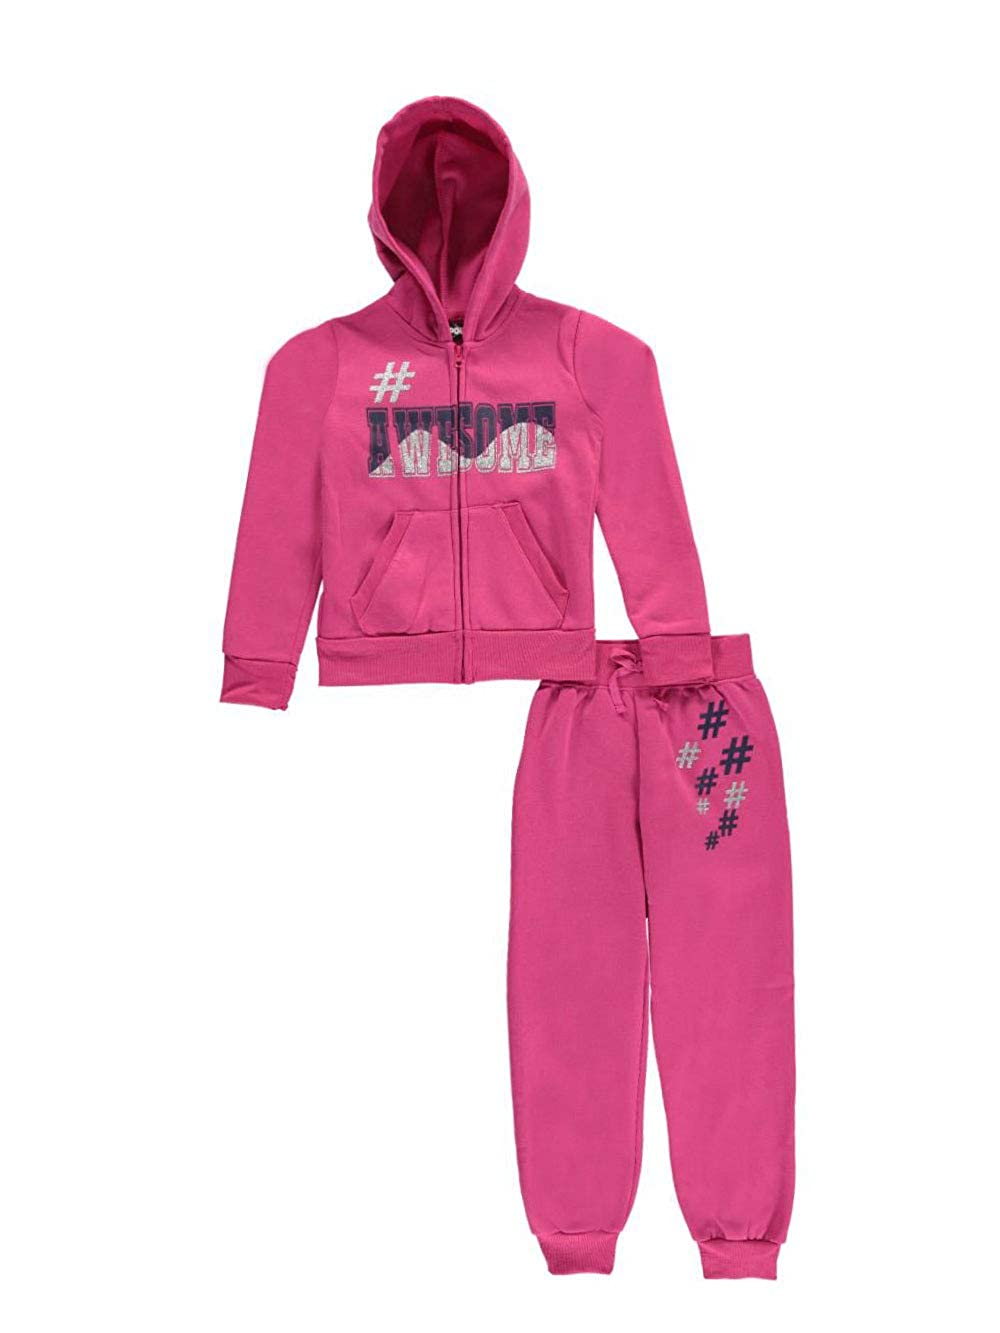 Chillipop Big Girls' #Awesome 2-Piece Fleece Sweatsuit 10-12